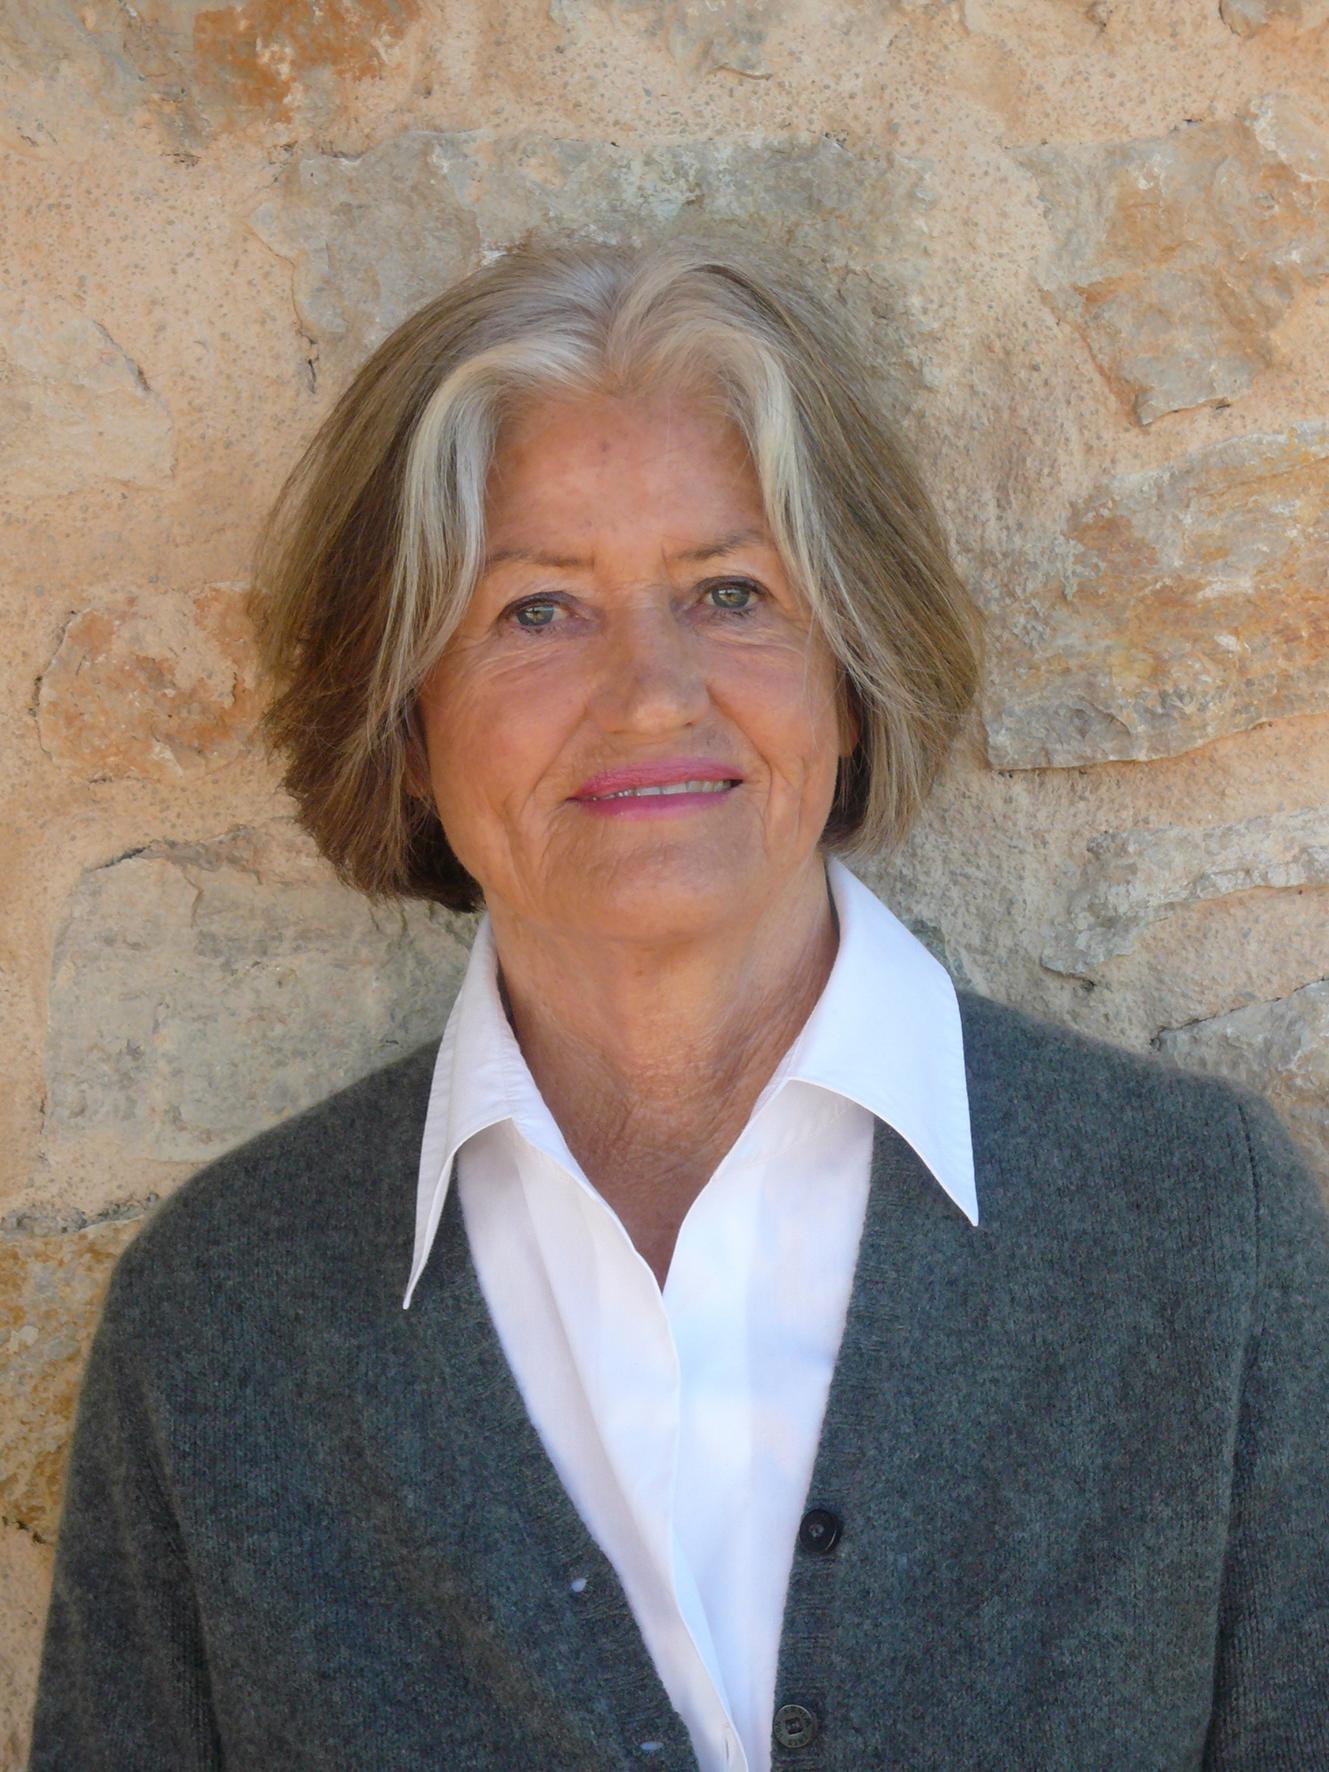 Brigitte Blobel